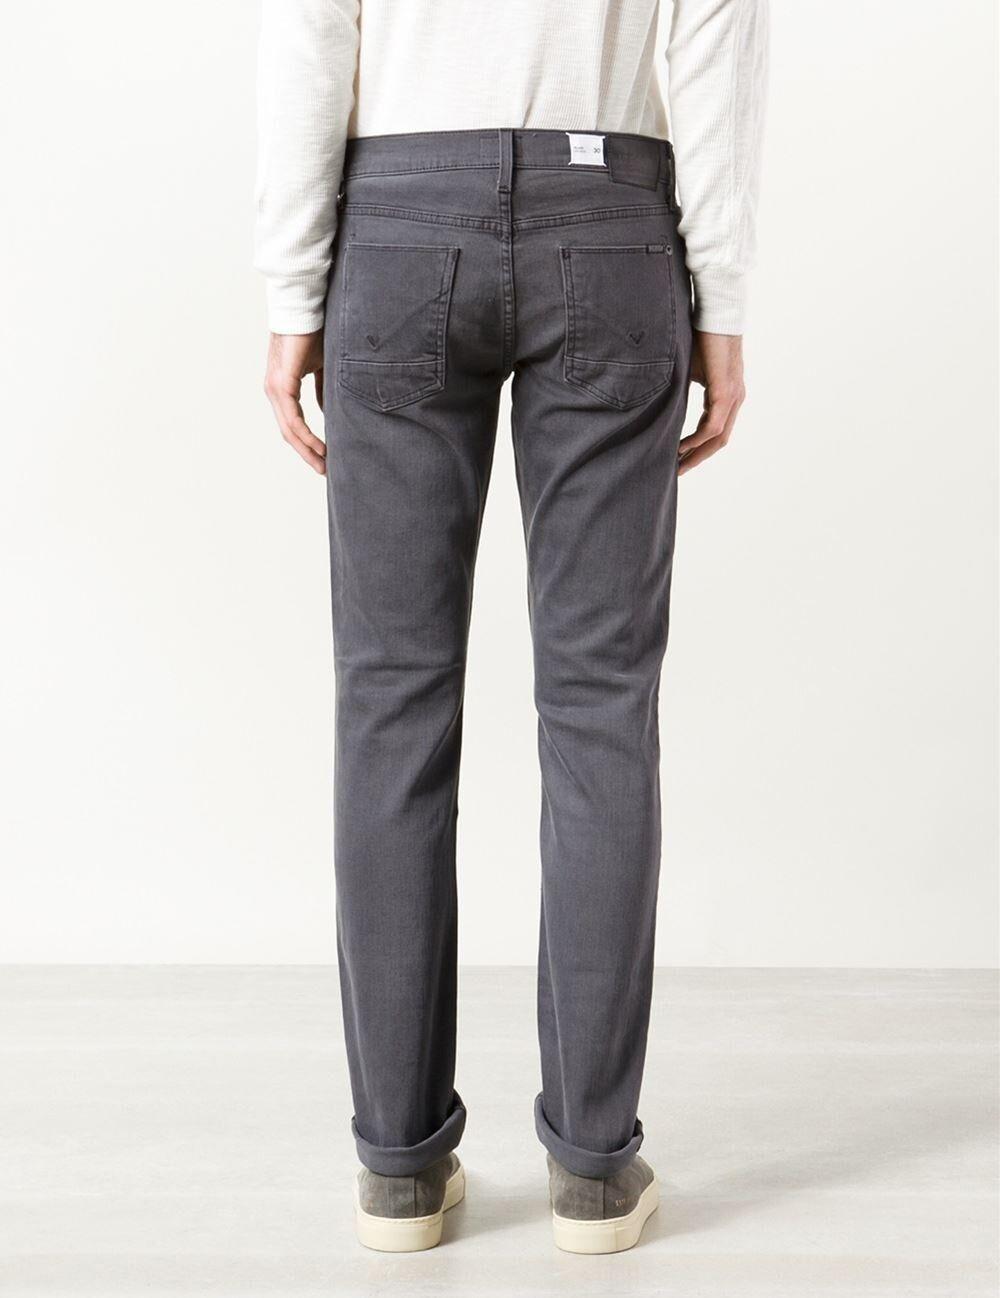 New Hudson Men's Blake Grey Straight Slim Casual Pants Denim Jeans Trousers